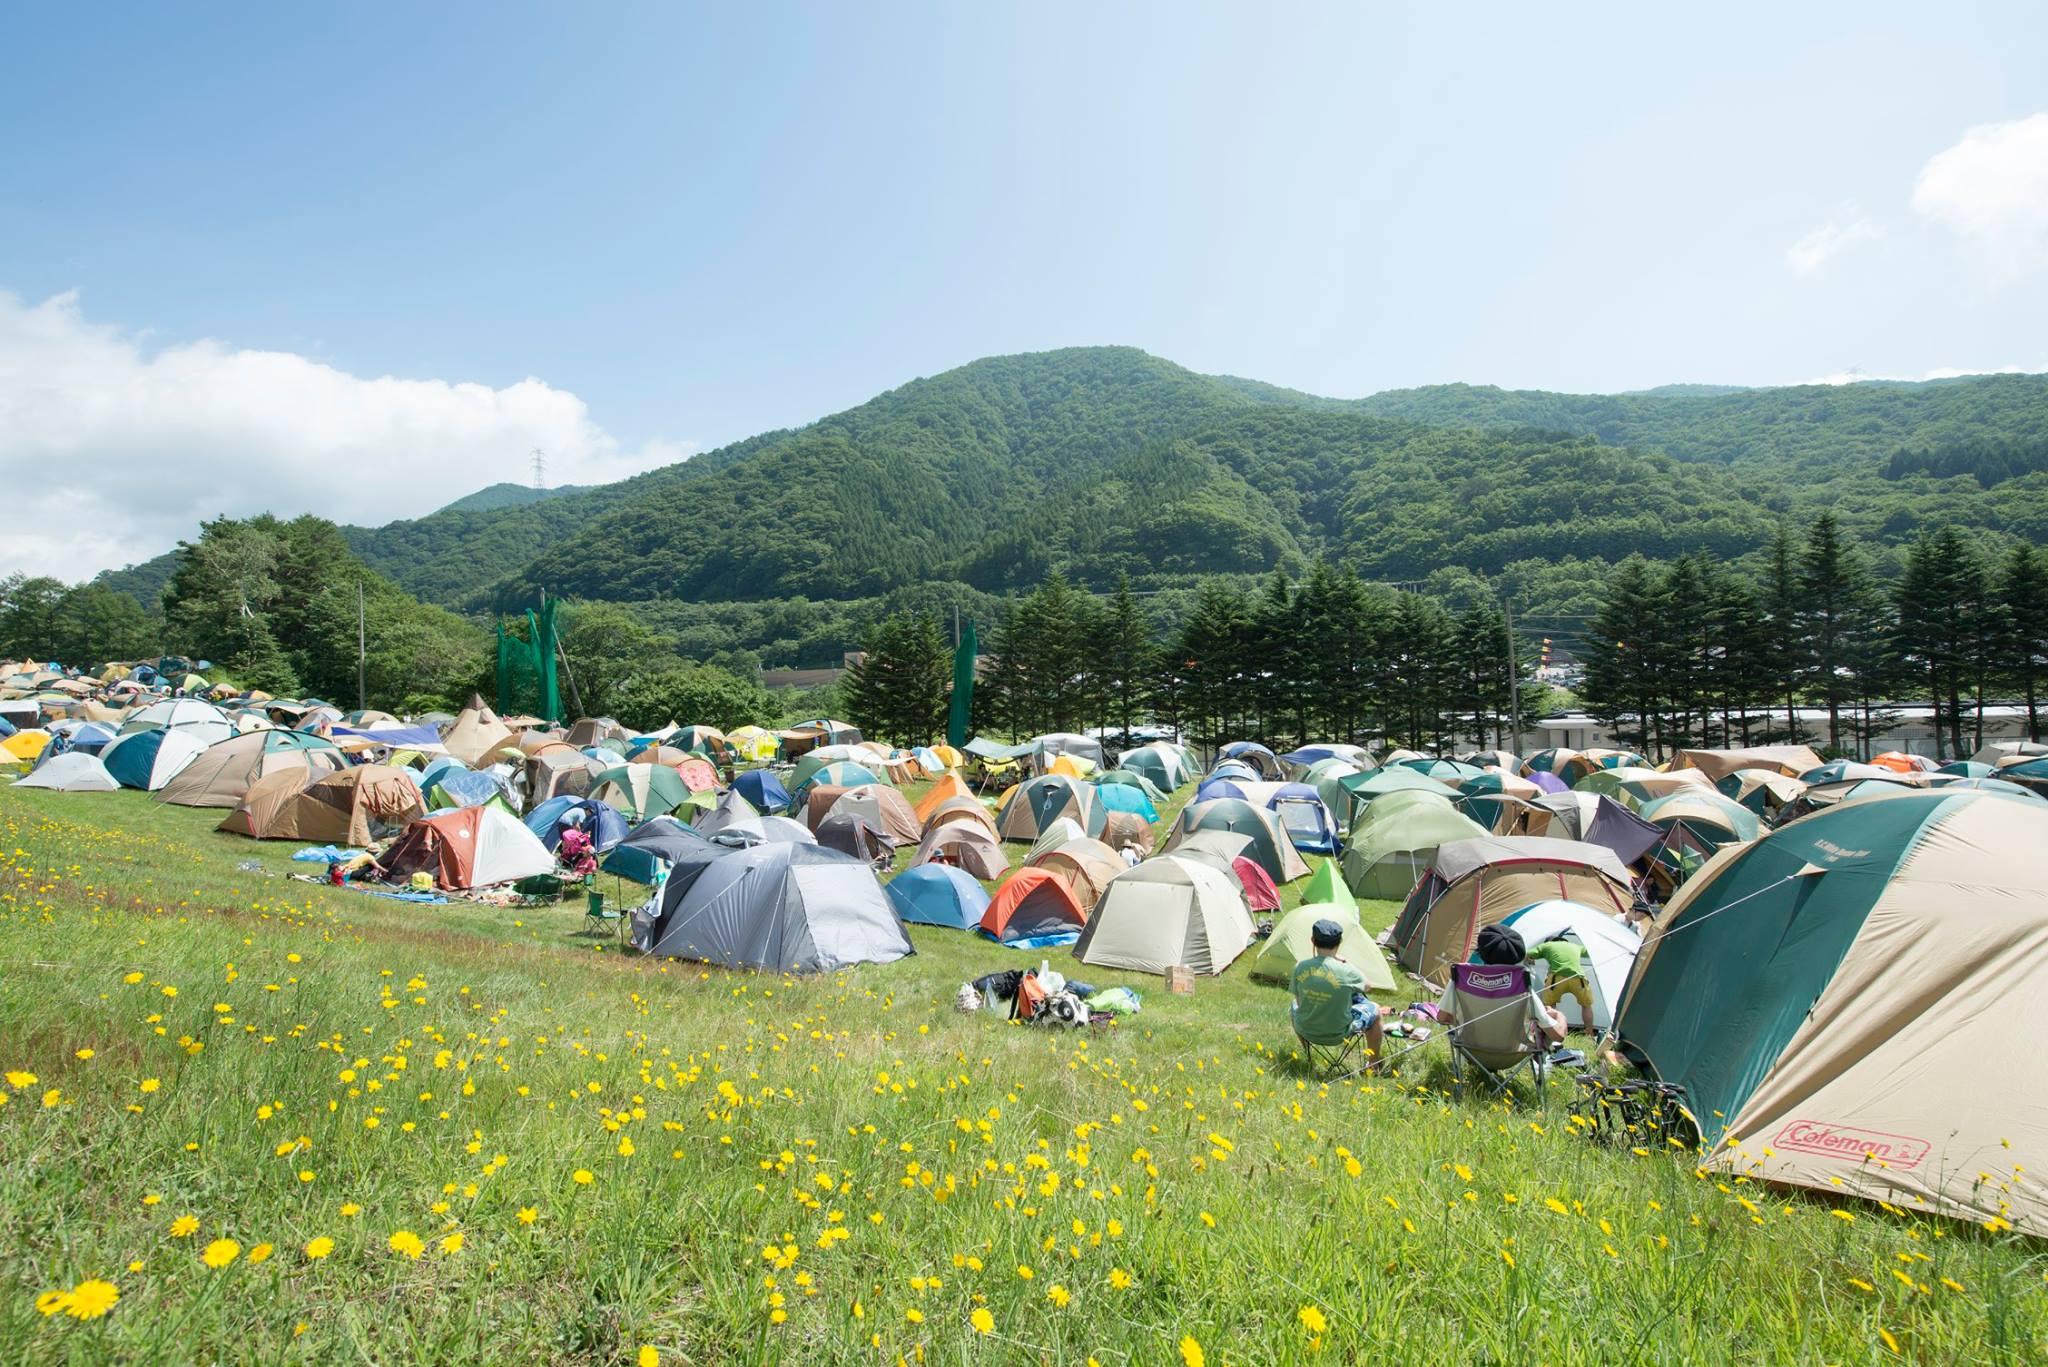 Photo Credit: Fuji-Rock